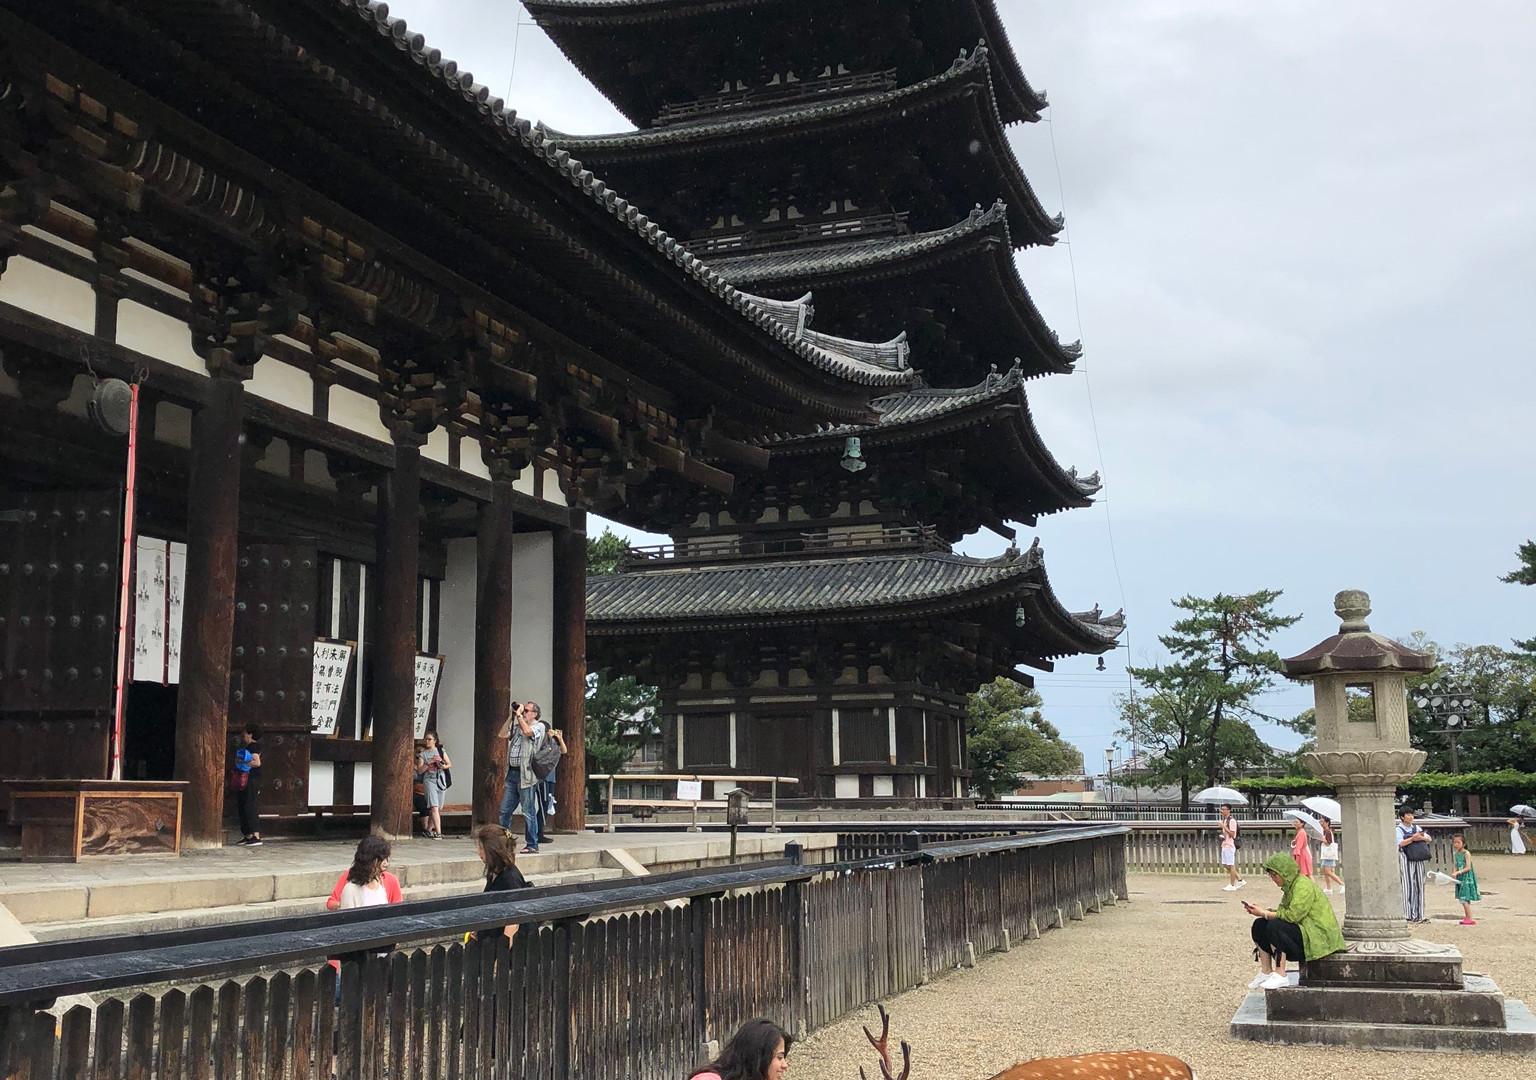 Kofukuji Temple Tower, Nara